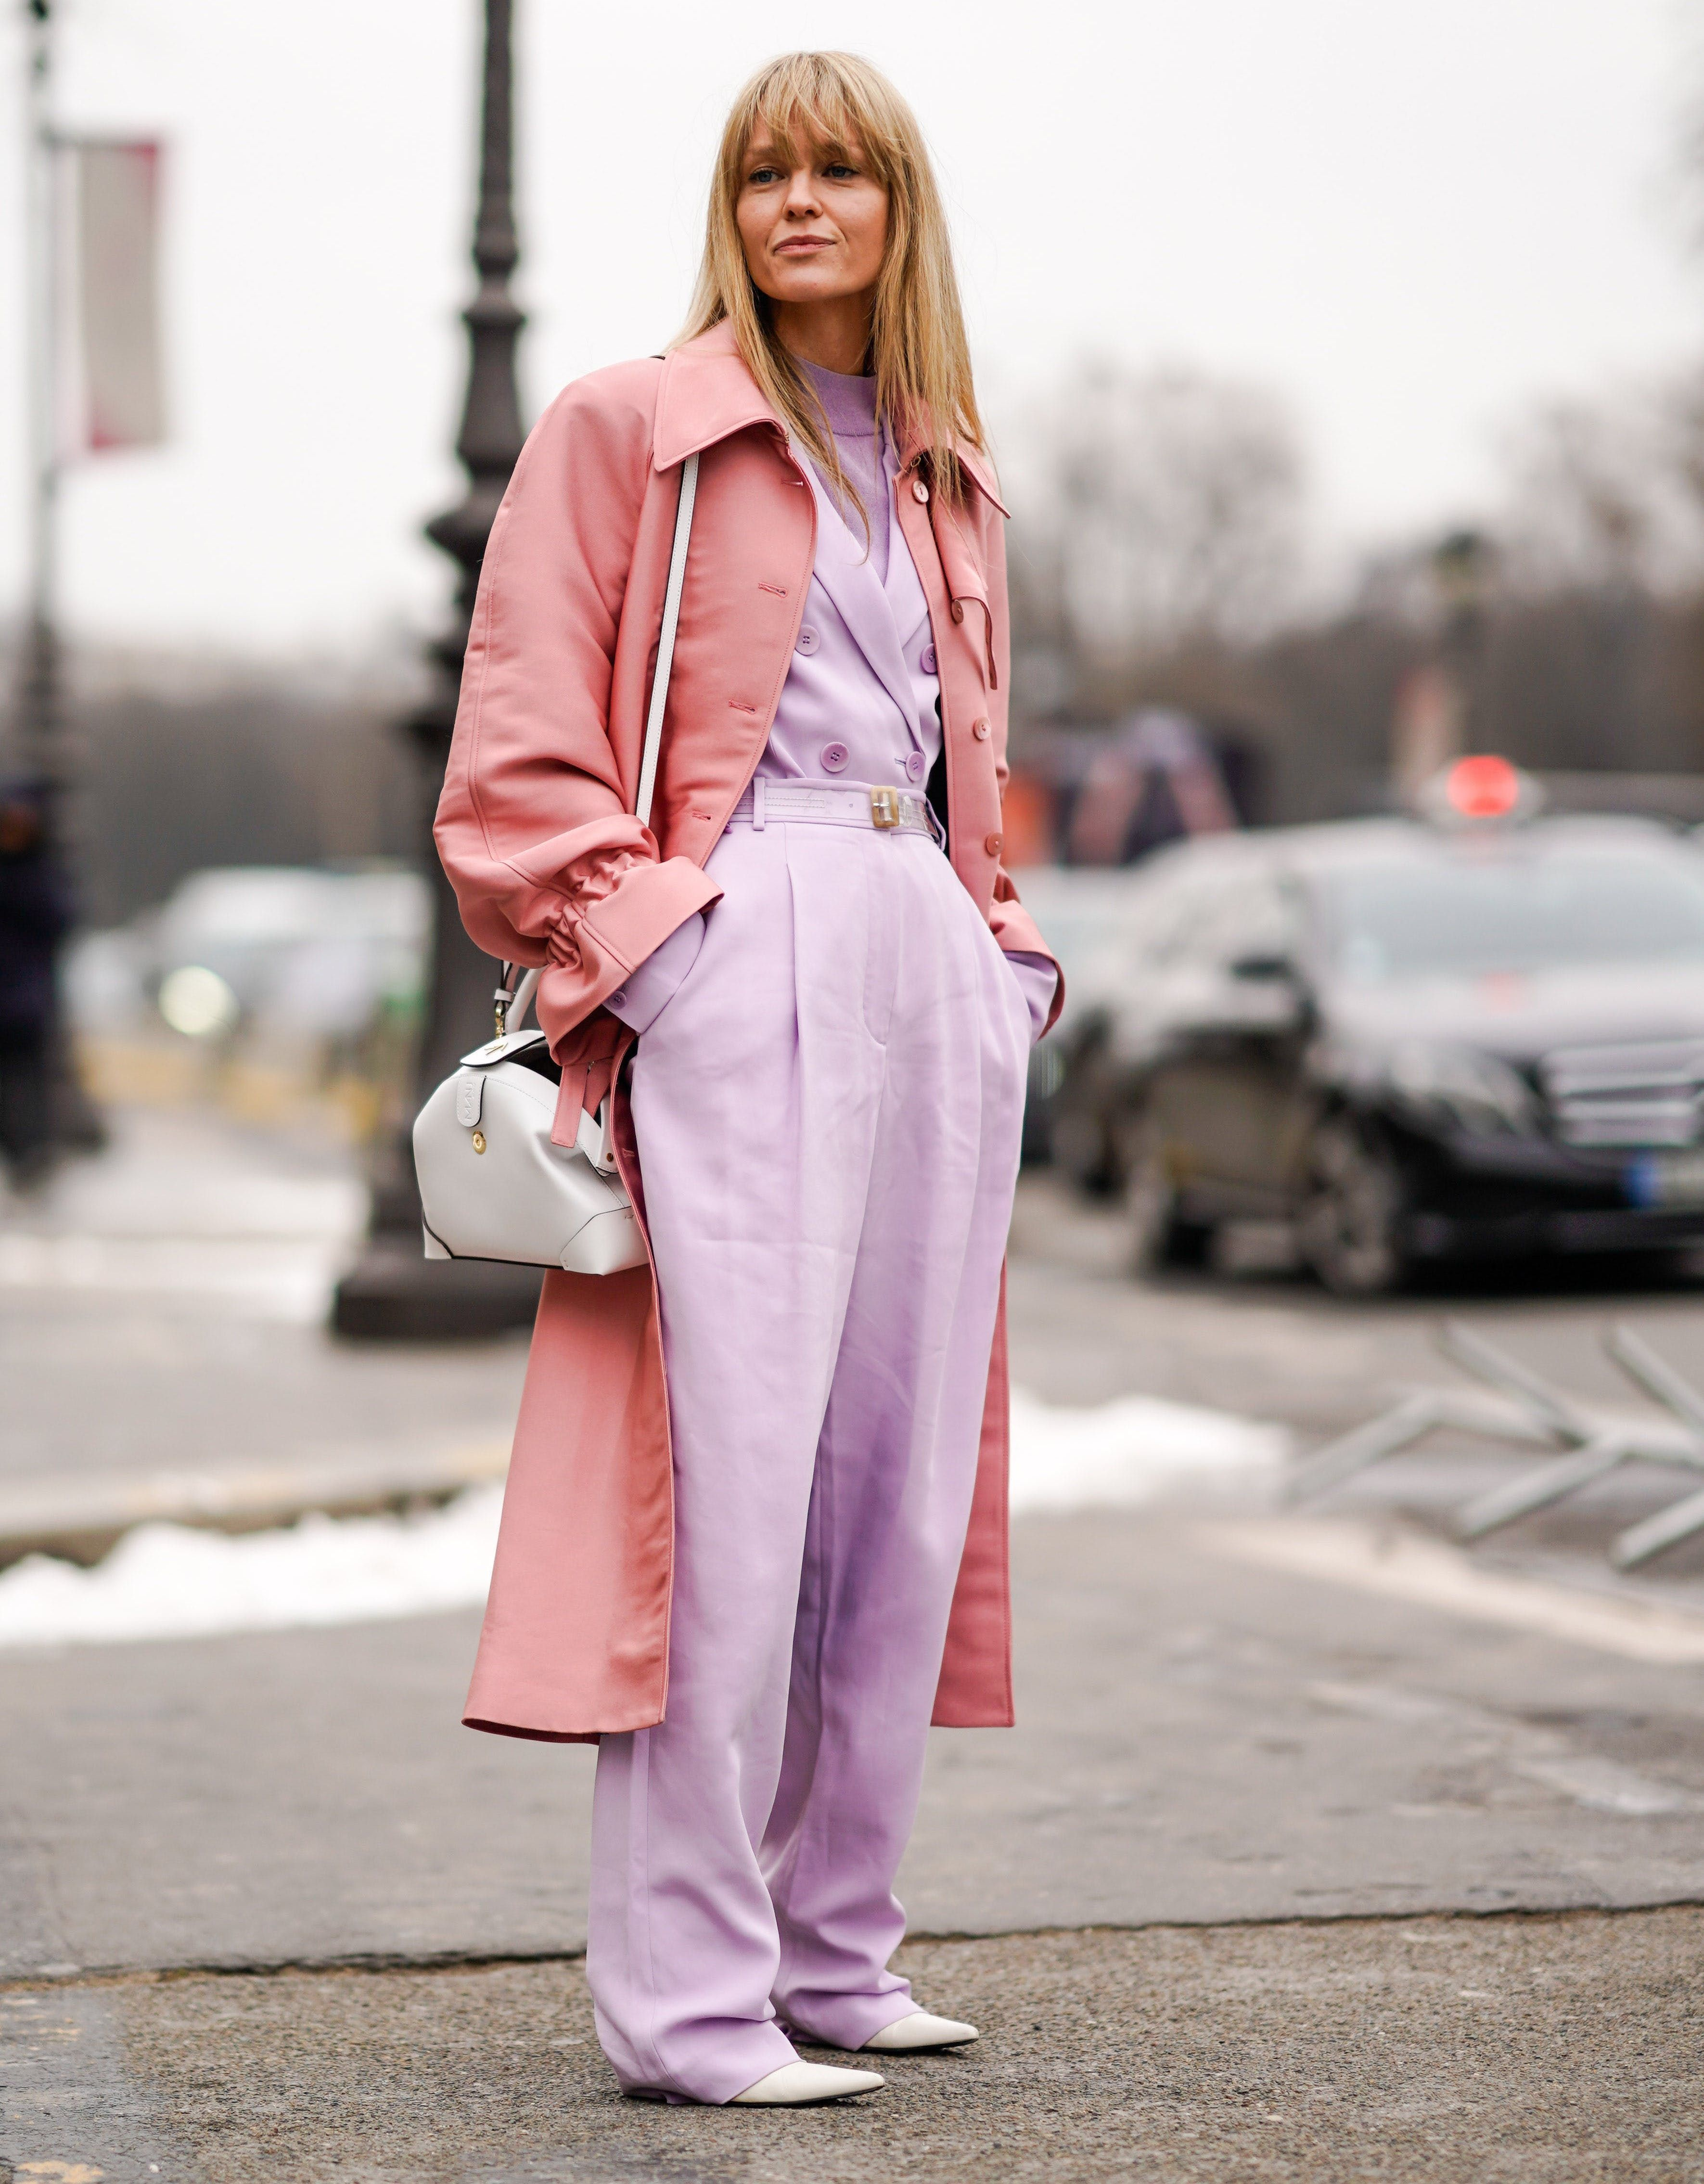 f1f2de0c9e60 dusty rose jacket and lavender pants Color Combinations For Clothes